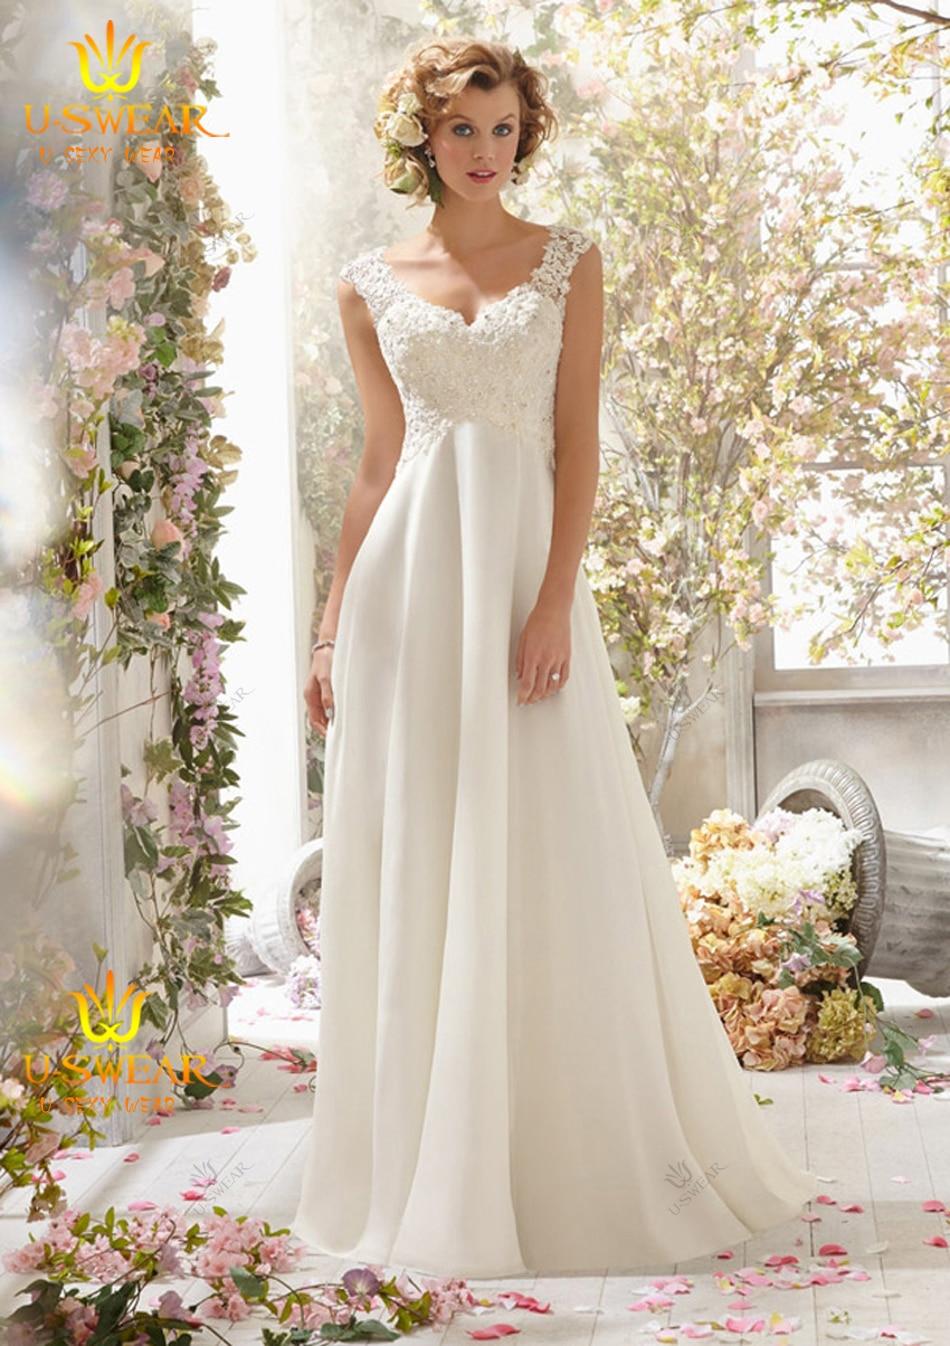 Elegant Wedding Dress Hire Nottingham Vellenanet With Bridesmaid Dresses